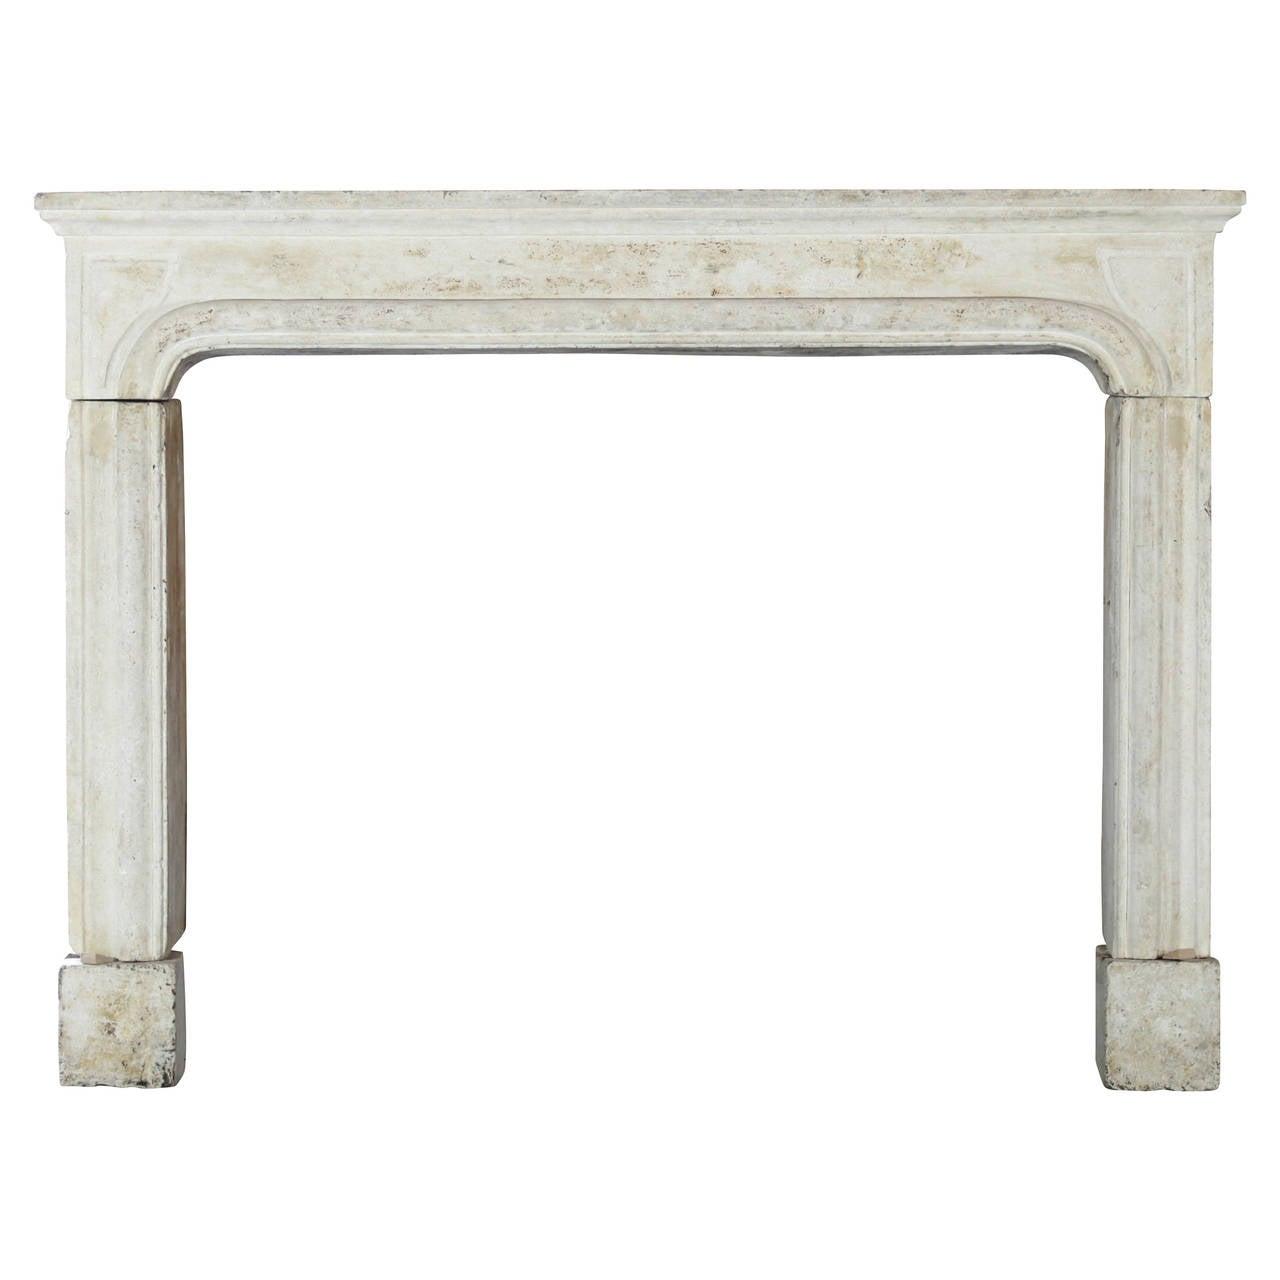 17th Century limestone antique fireplace mantel - Louis XIV period